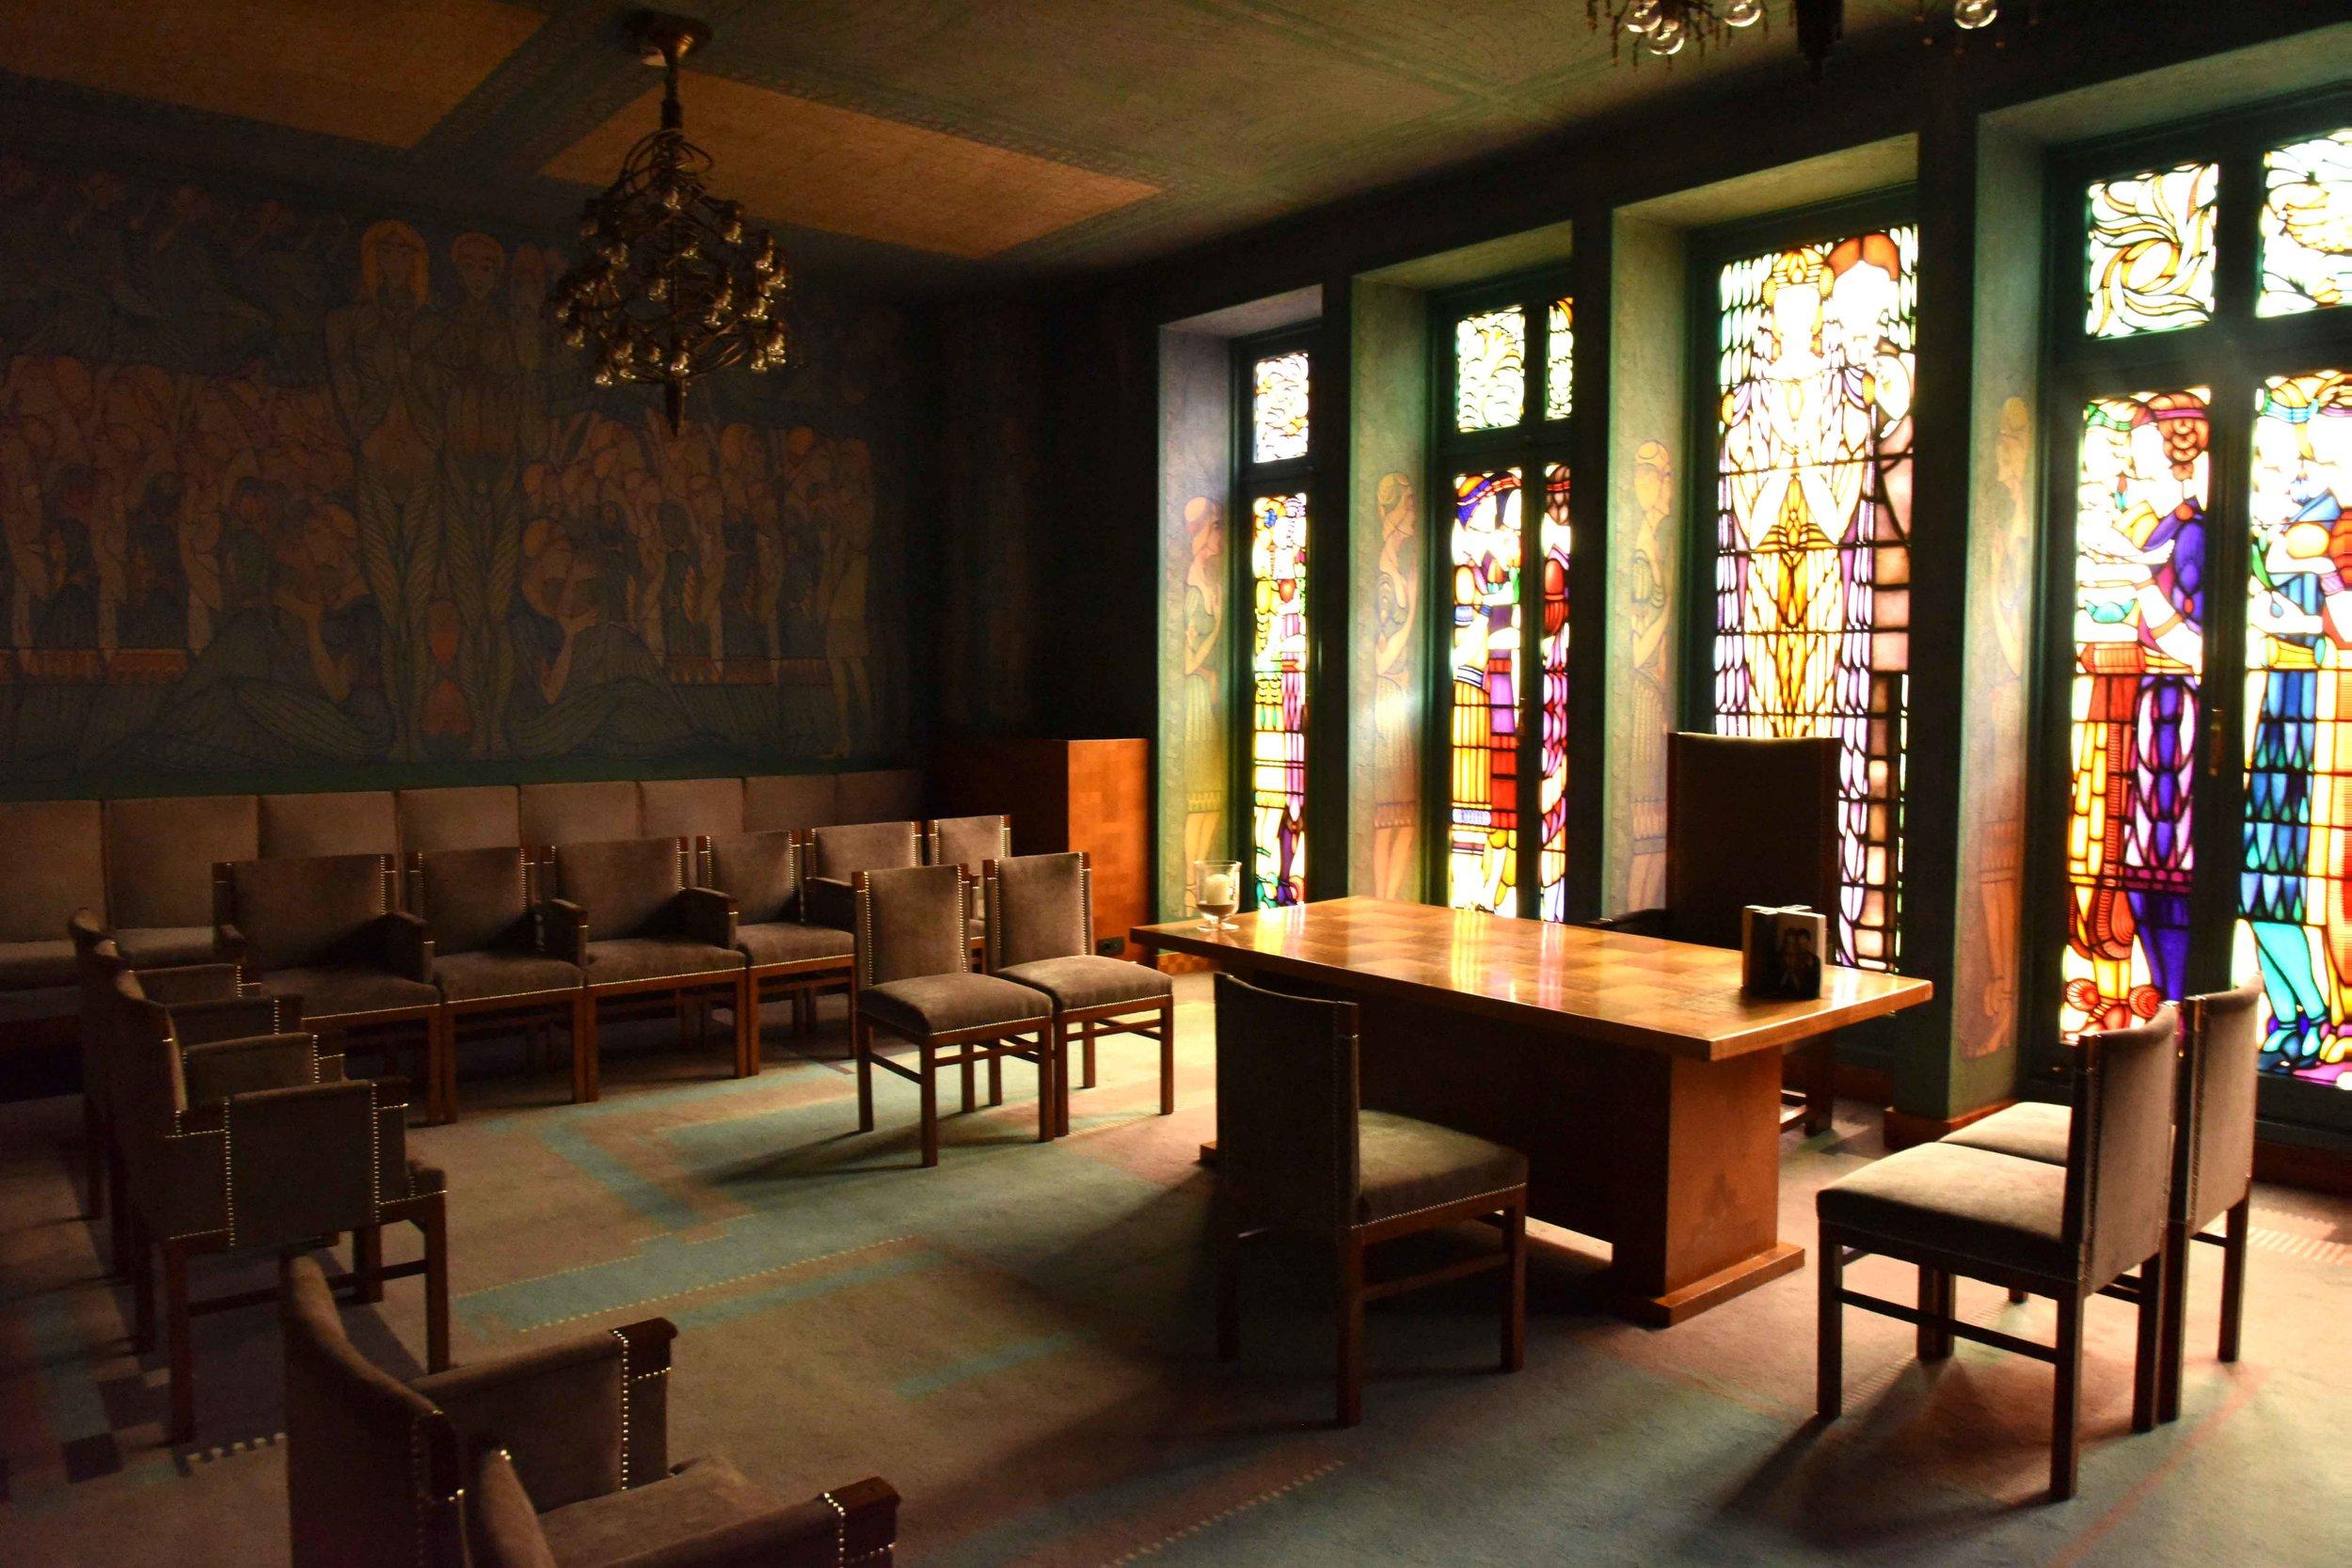 Marriage Chamber,Sofitel Legend Amsterdam The Grand. Image©thingstodot.com